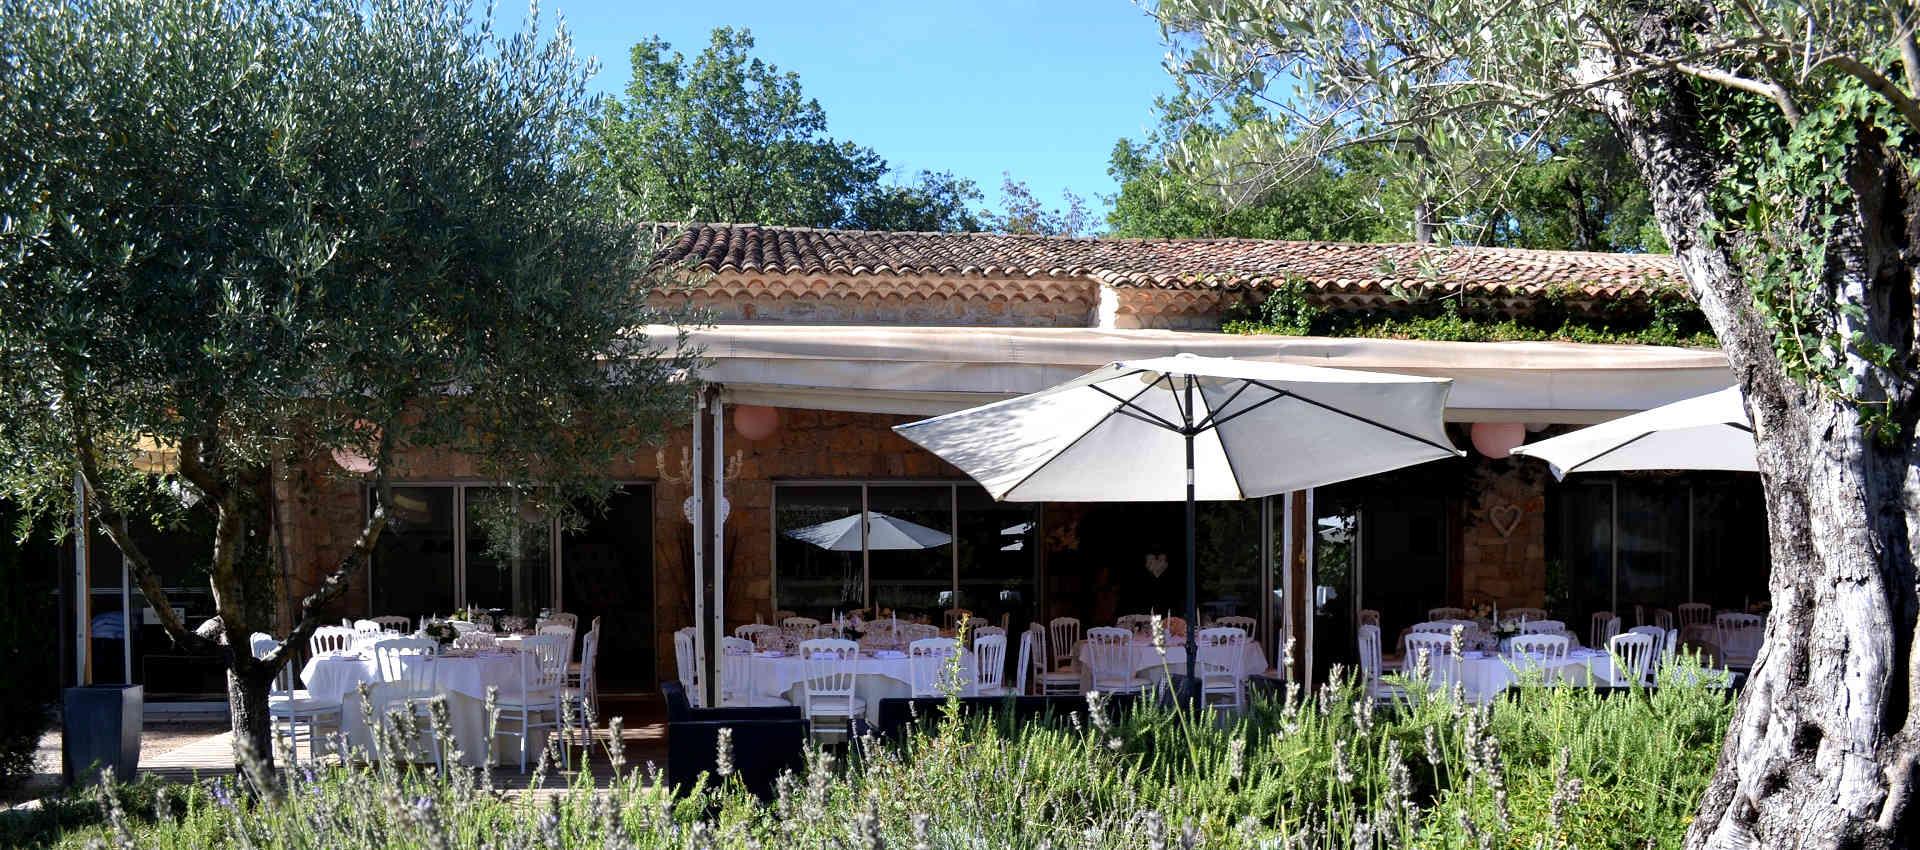 villa Simone - Roquefort-les-Pins